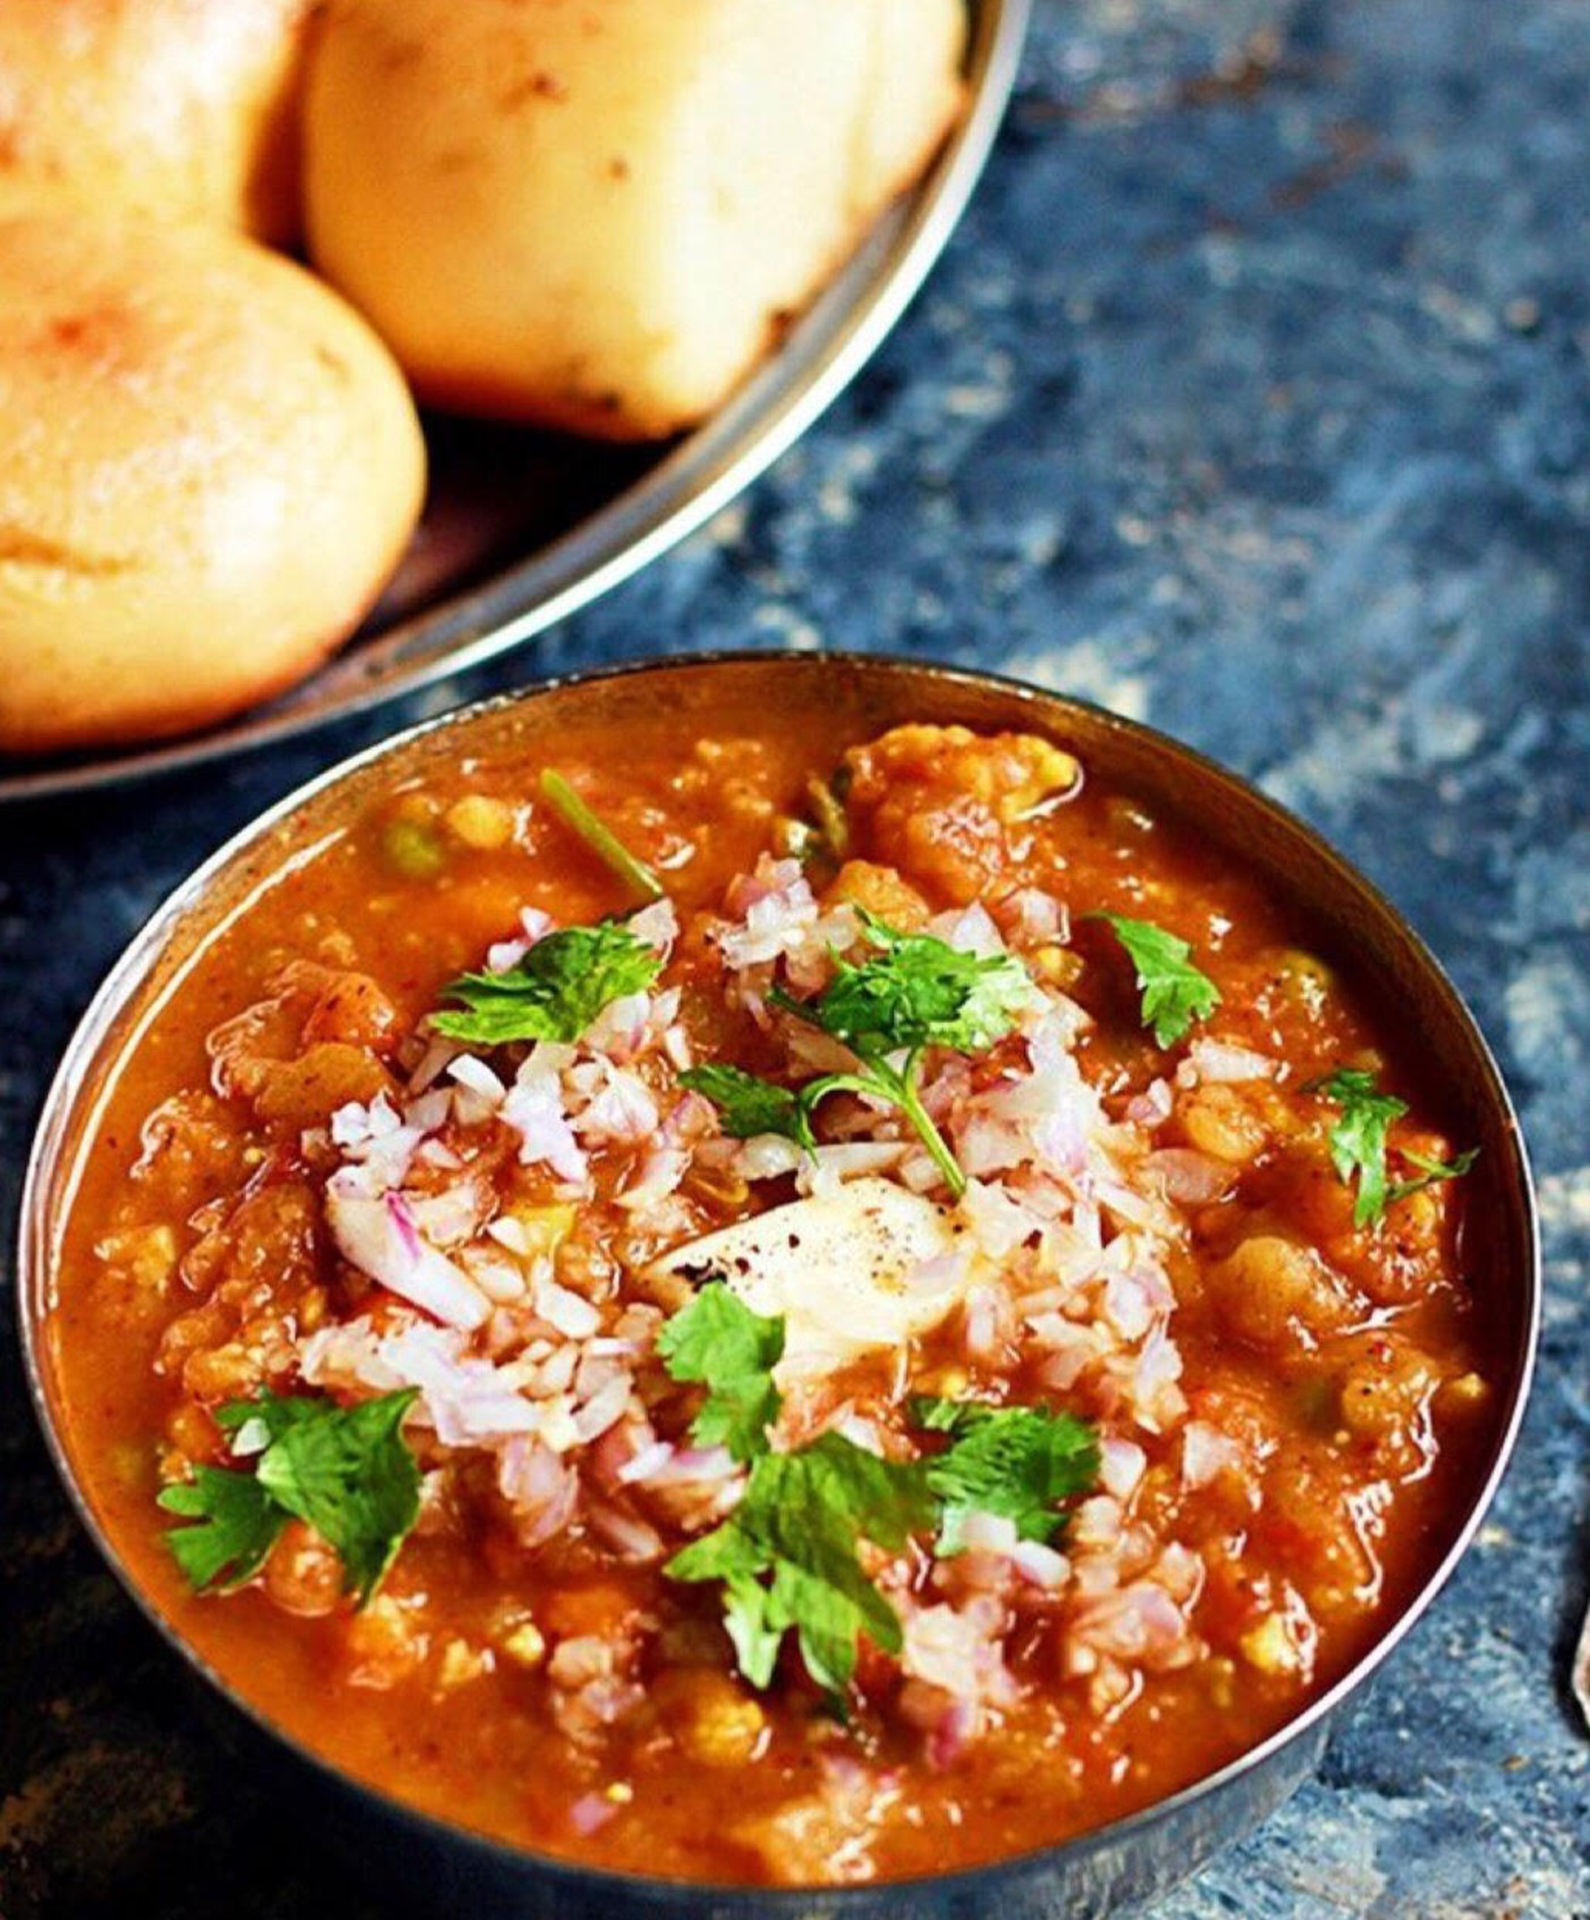 Portico Is Serving Chicken Pav Bhaji. image